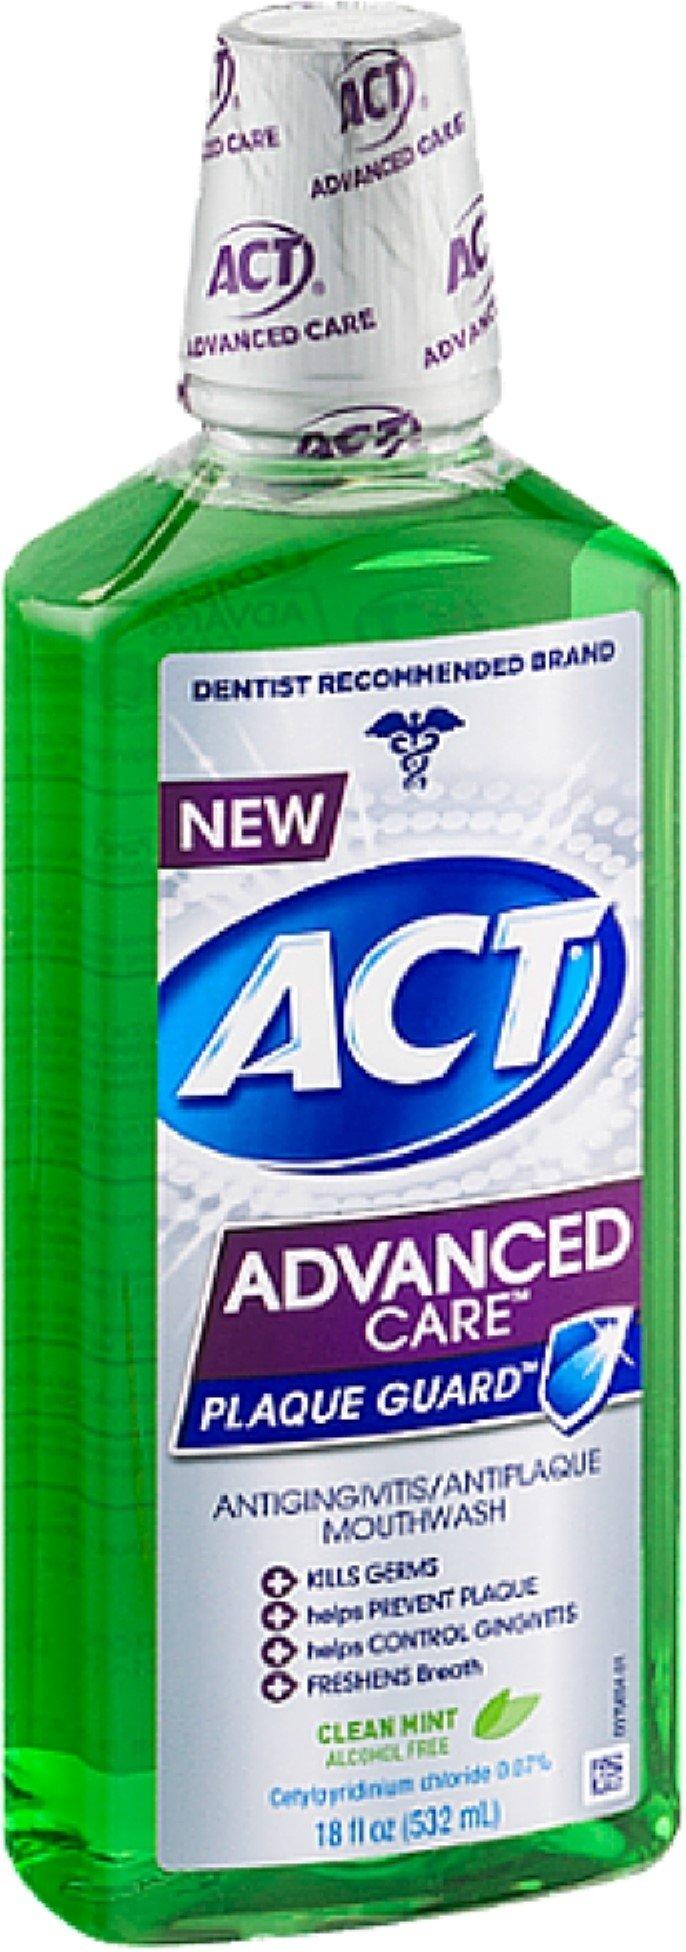 ACT Advanced Care Plaque Guard Mouthwash, Clean Mint 18 oz (Pack of 10)